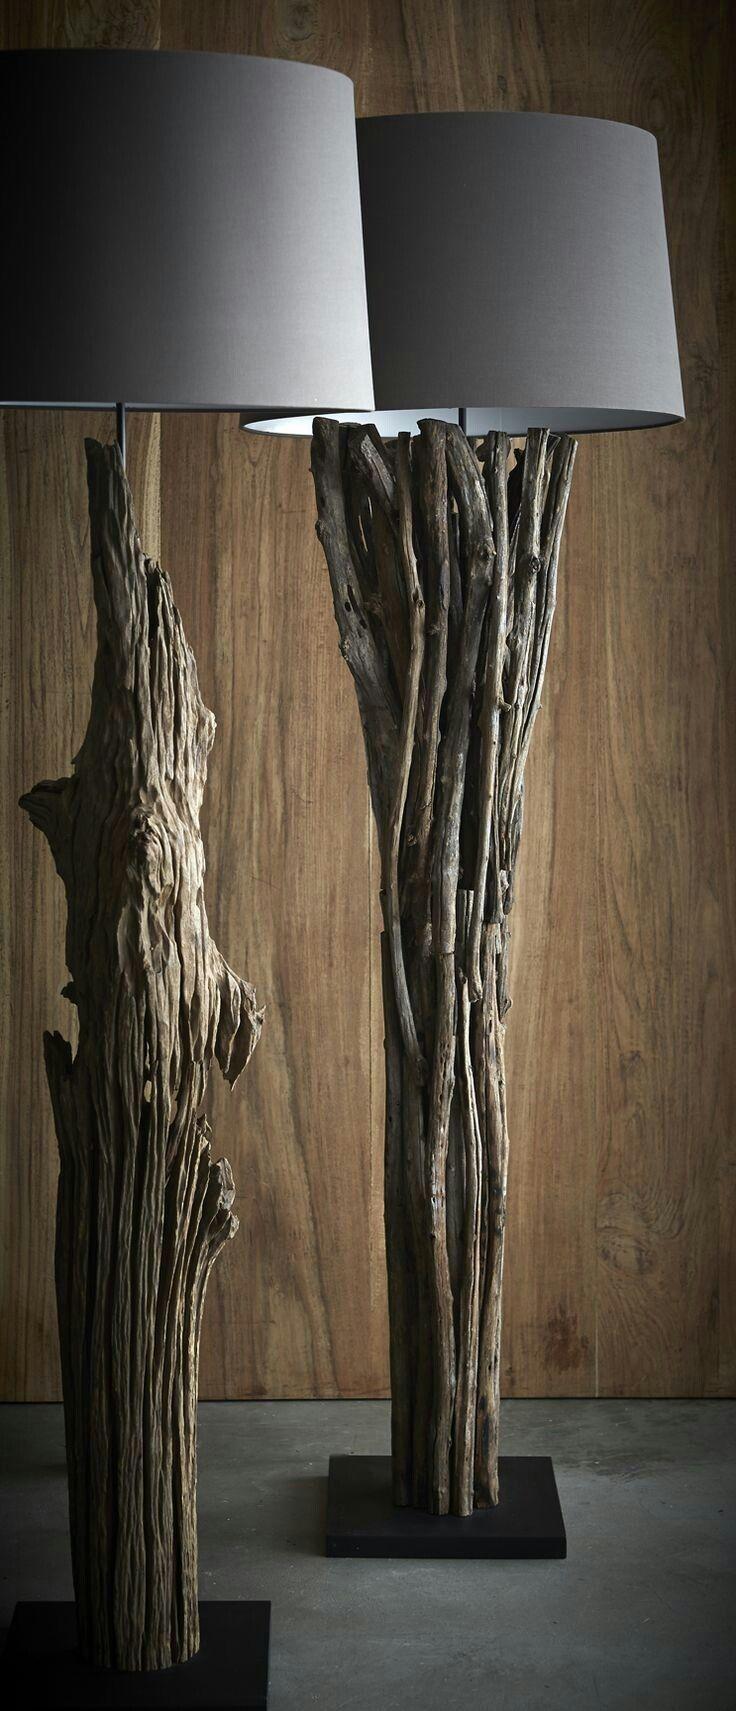 Pin de Kirsten Krol-Otten en DIY lampen | Pinterest